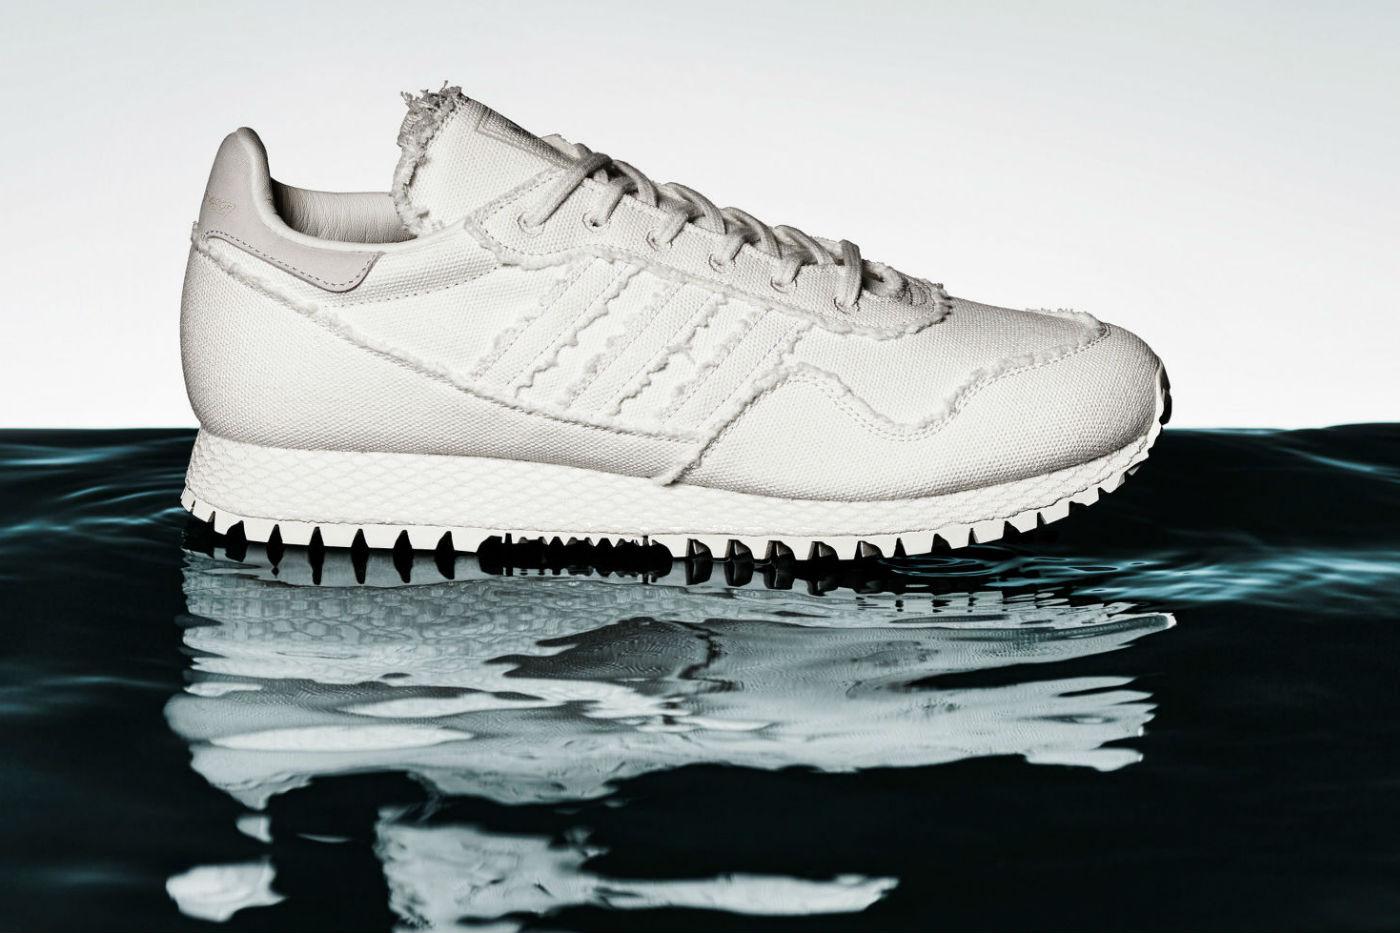 daniel arsham x adidas originals new york